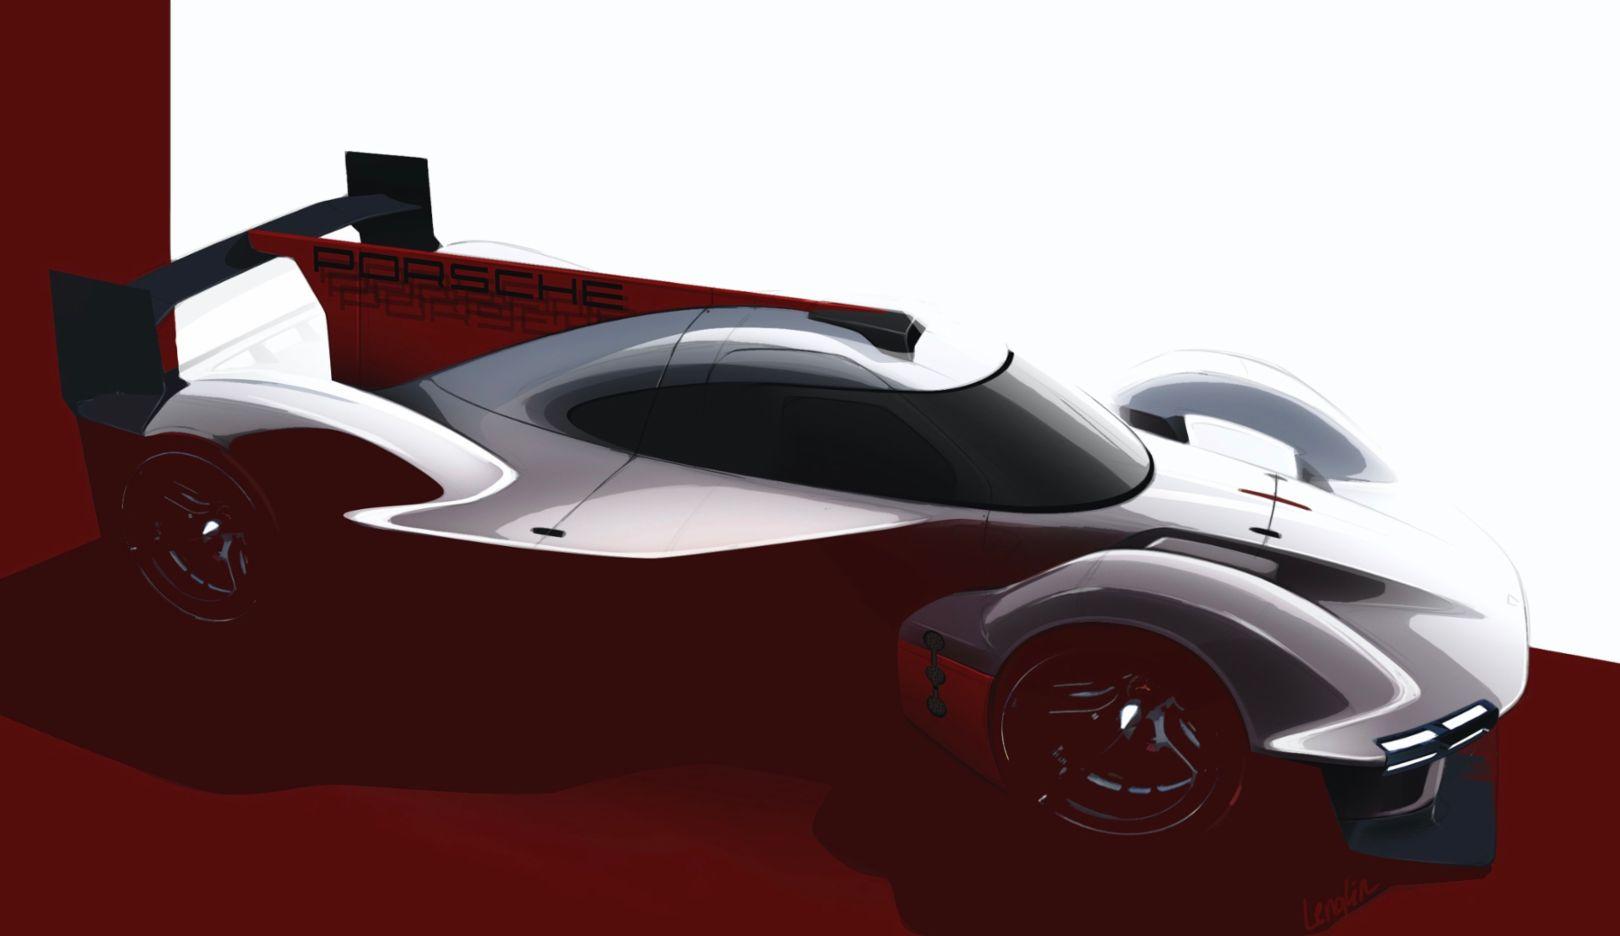 Teaser image of the 2023 Porsche Motorsport LMDh prototype concept.